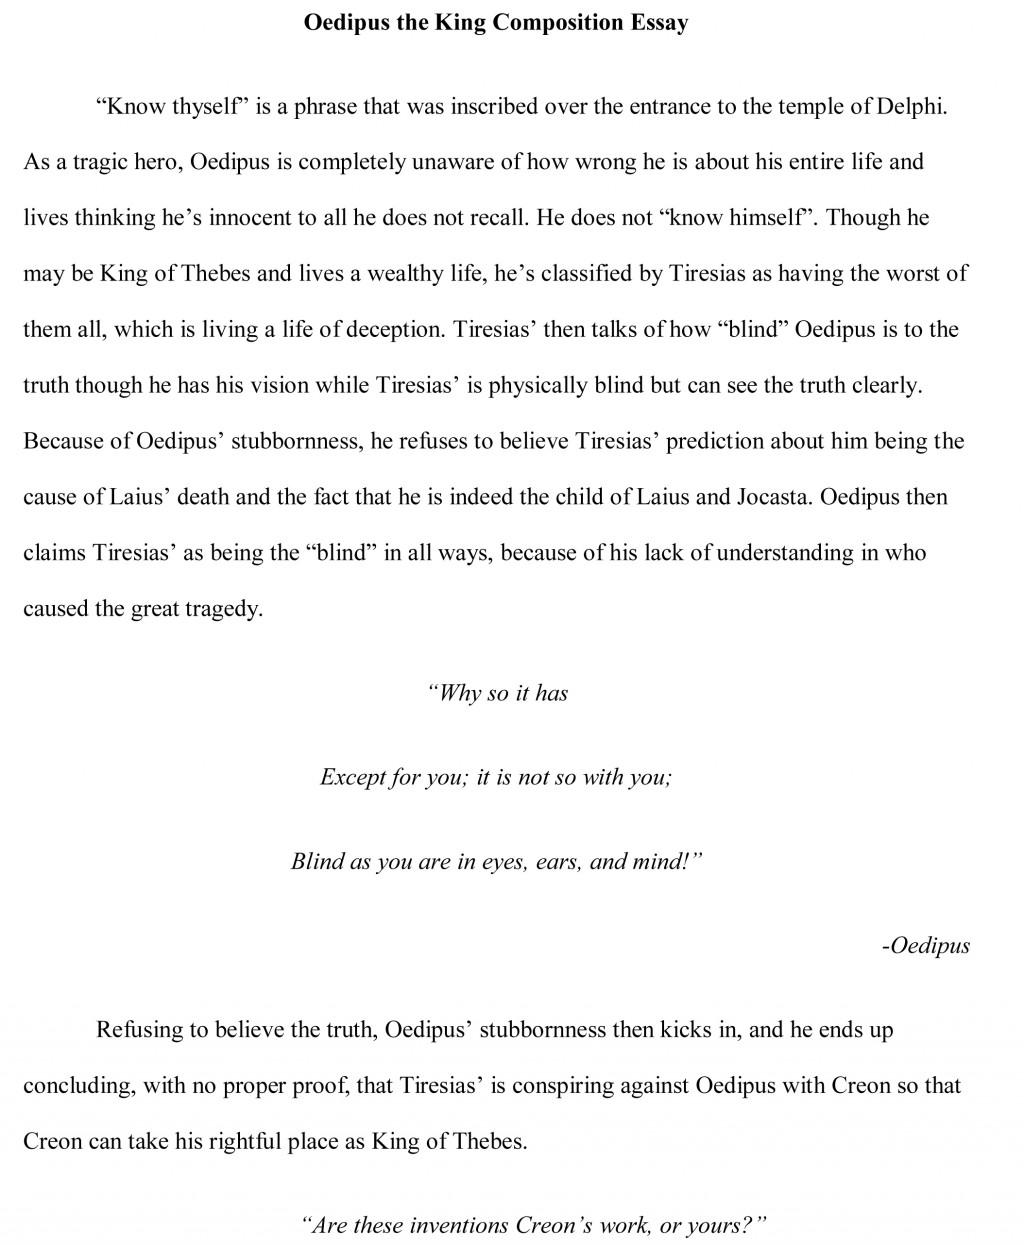 007 Best Essays Oedipus Essay Free Sample Breathtaking 2016 Personal College Australian Large